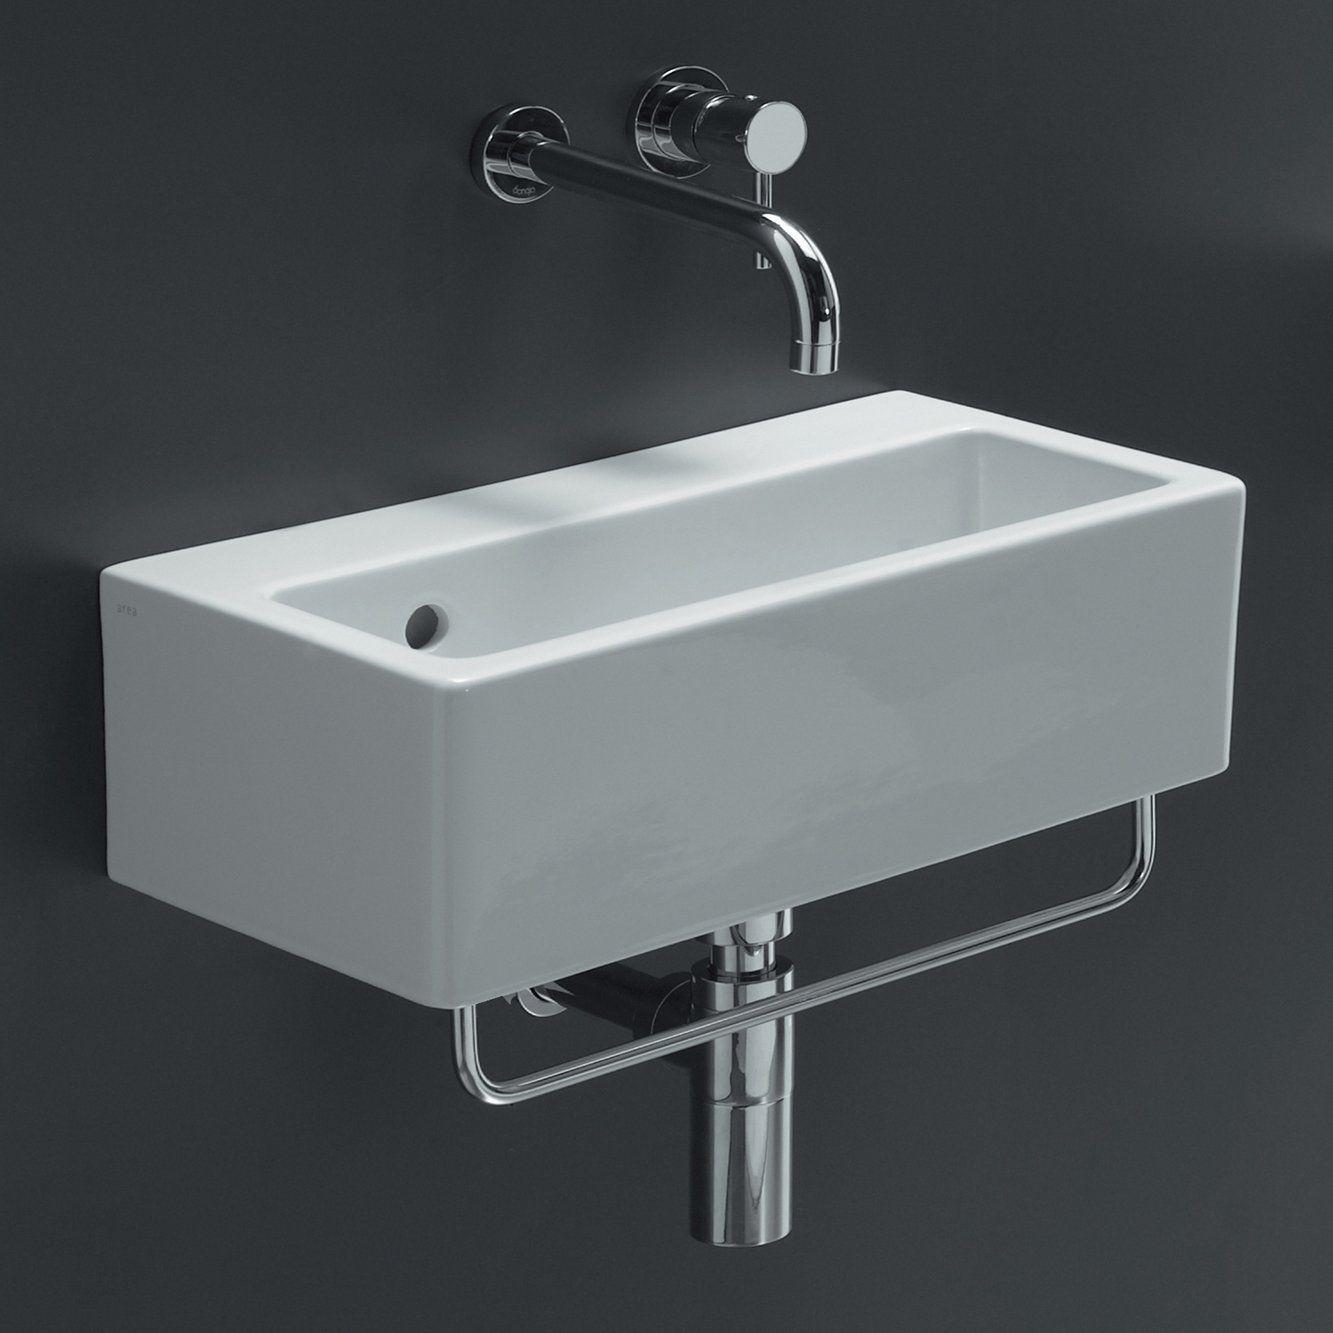 Bissonnet 20140 Wall Mount Bathroom Sink White 10 6 W X 19 7 L X 6 7 H 493 Ceramic Bathroom Sink Contemporary Bathroom Sinks Wall Mounted Bathroom Sink [ 1333 x 1333 Pixel ]